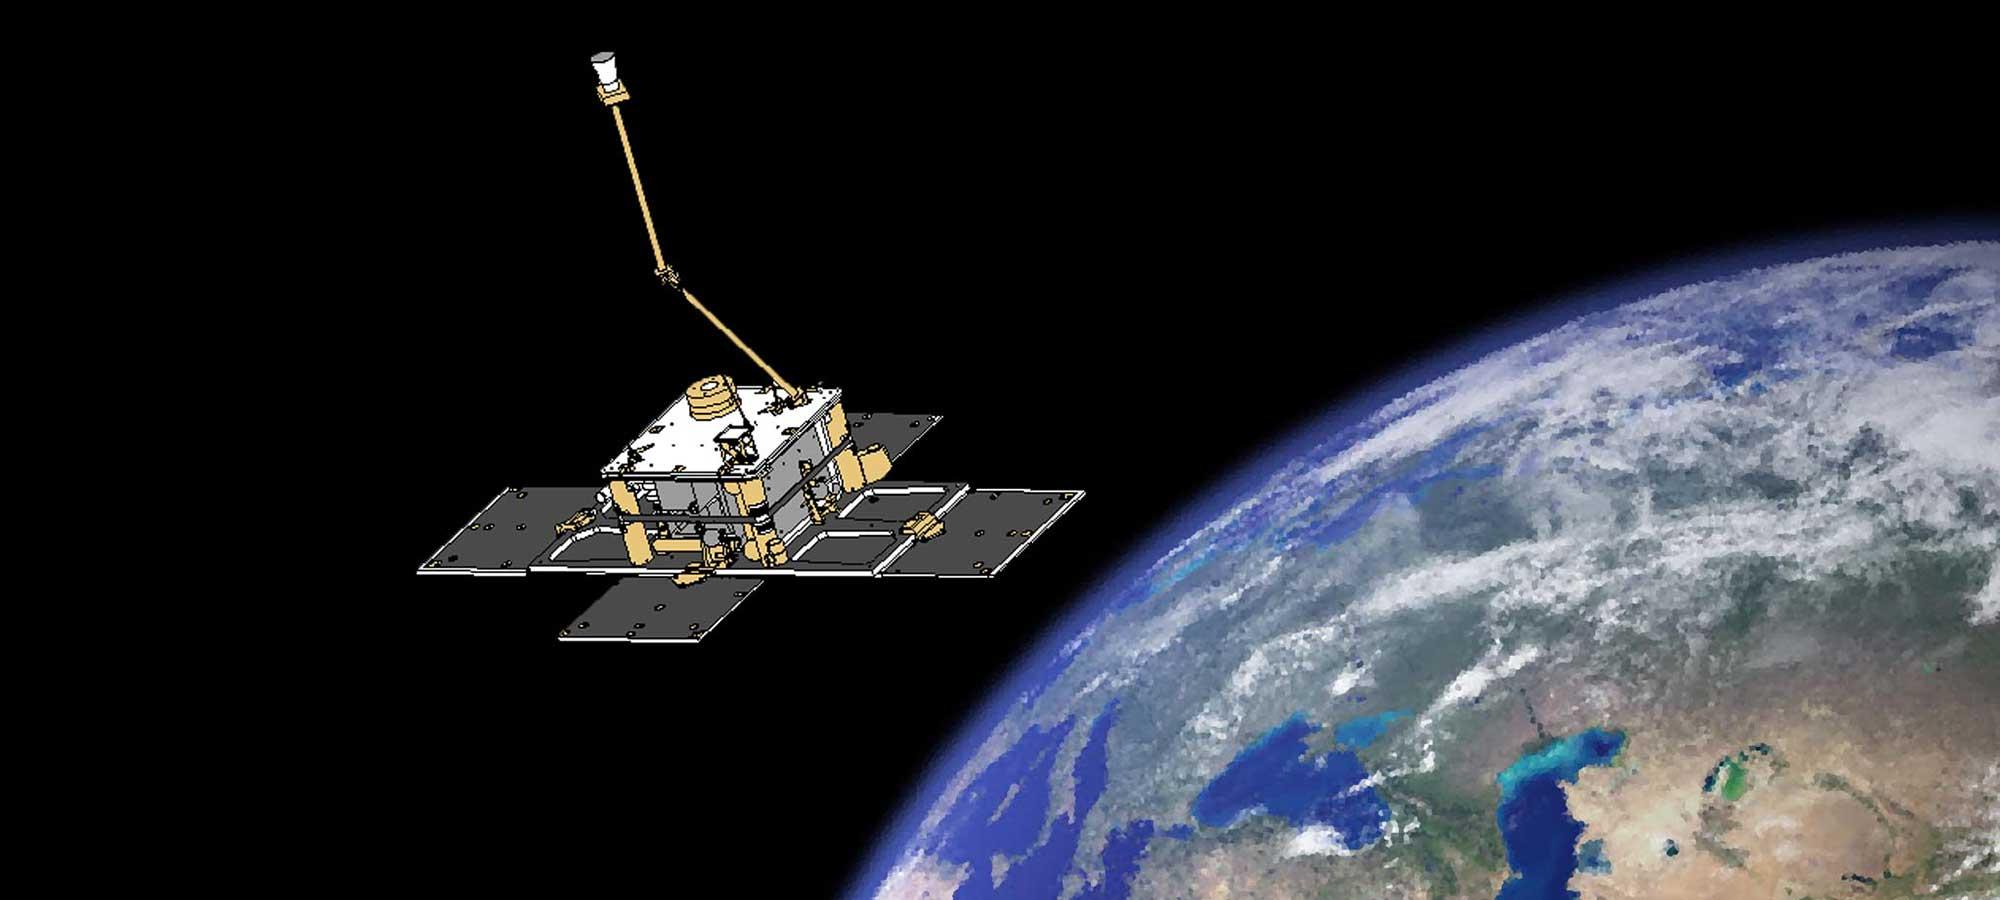 Satelliten Astrid 2